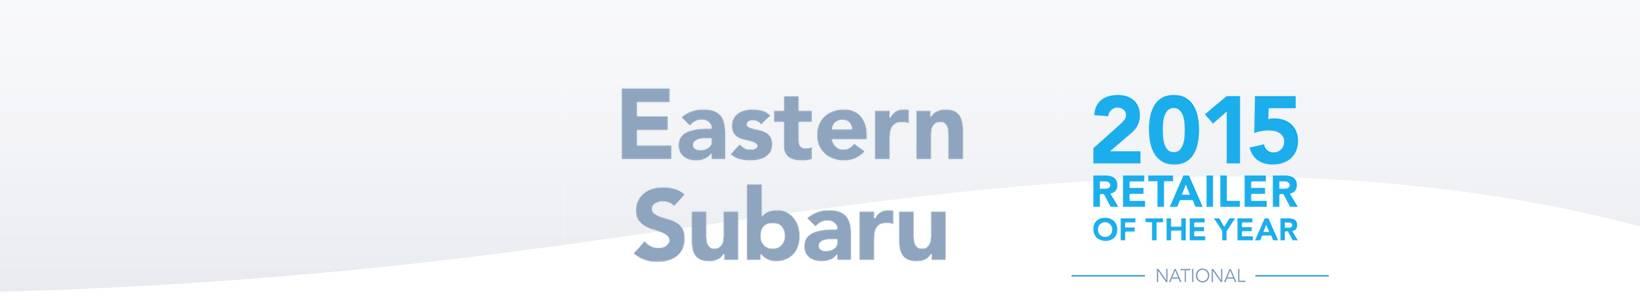 Eastern Subaru